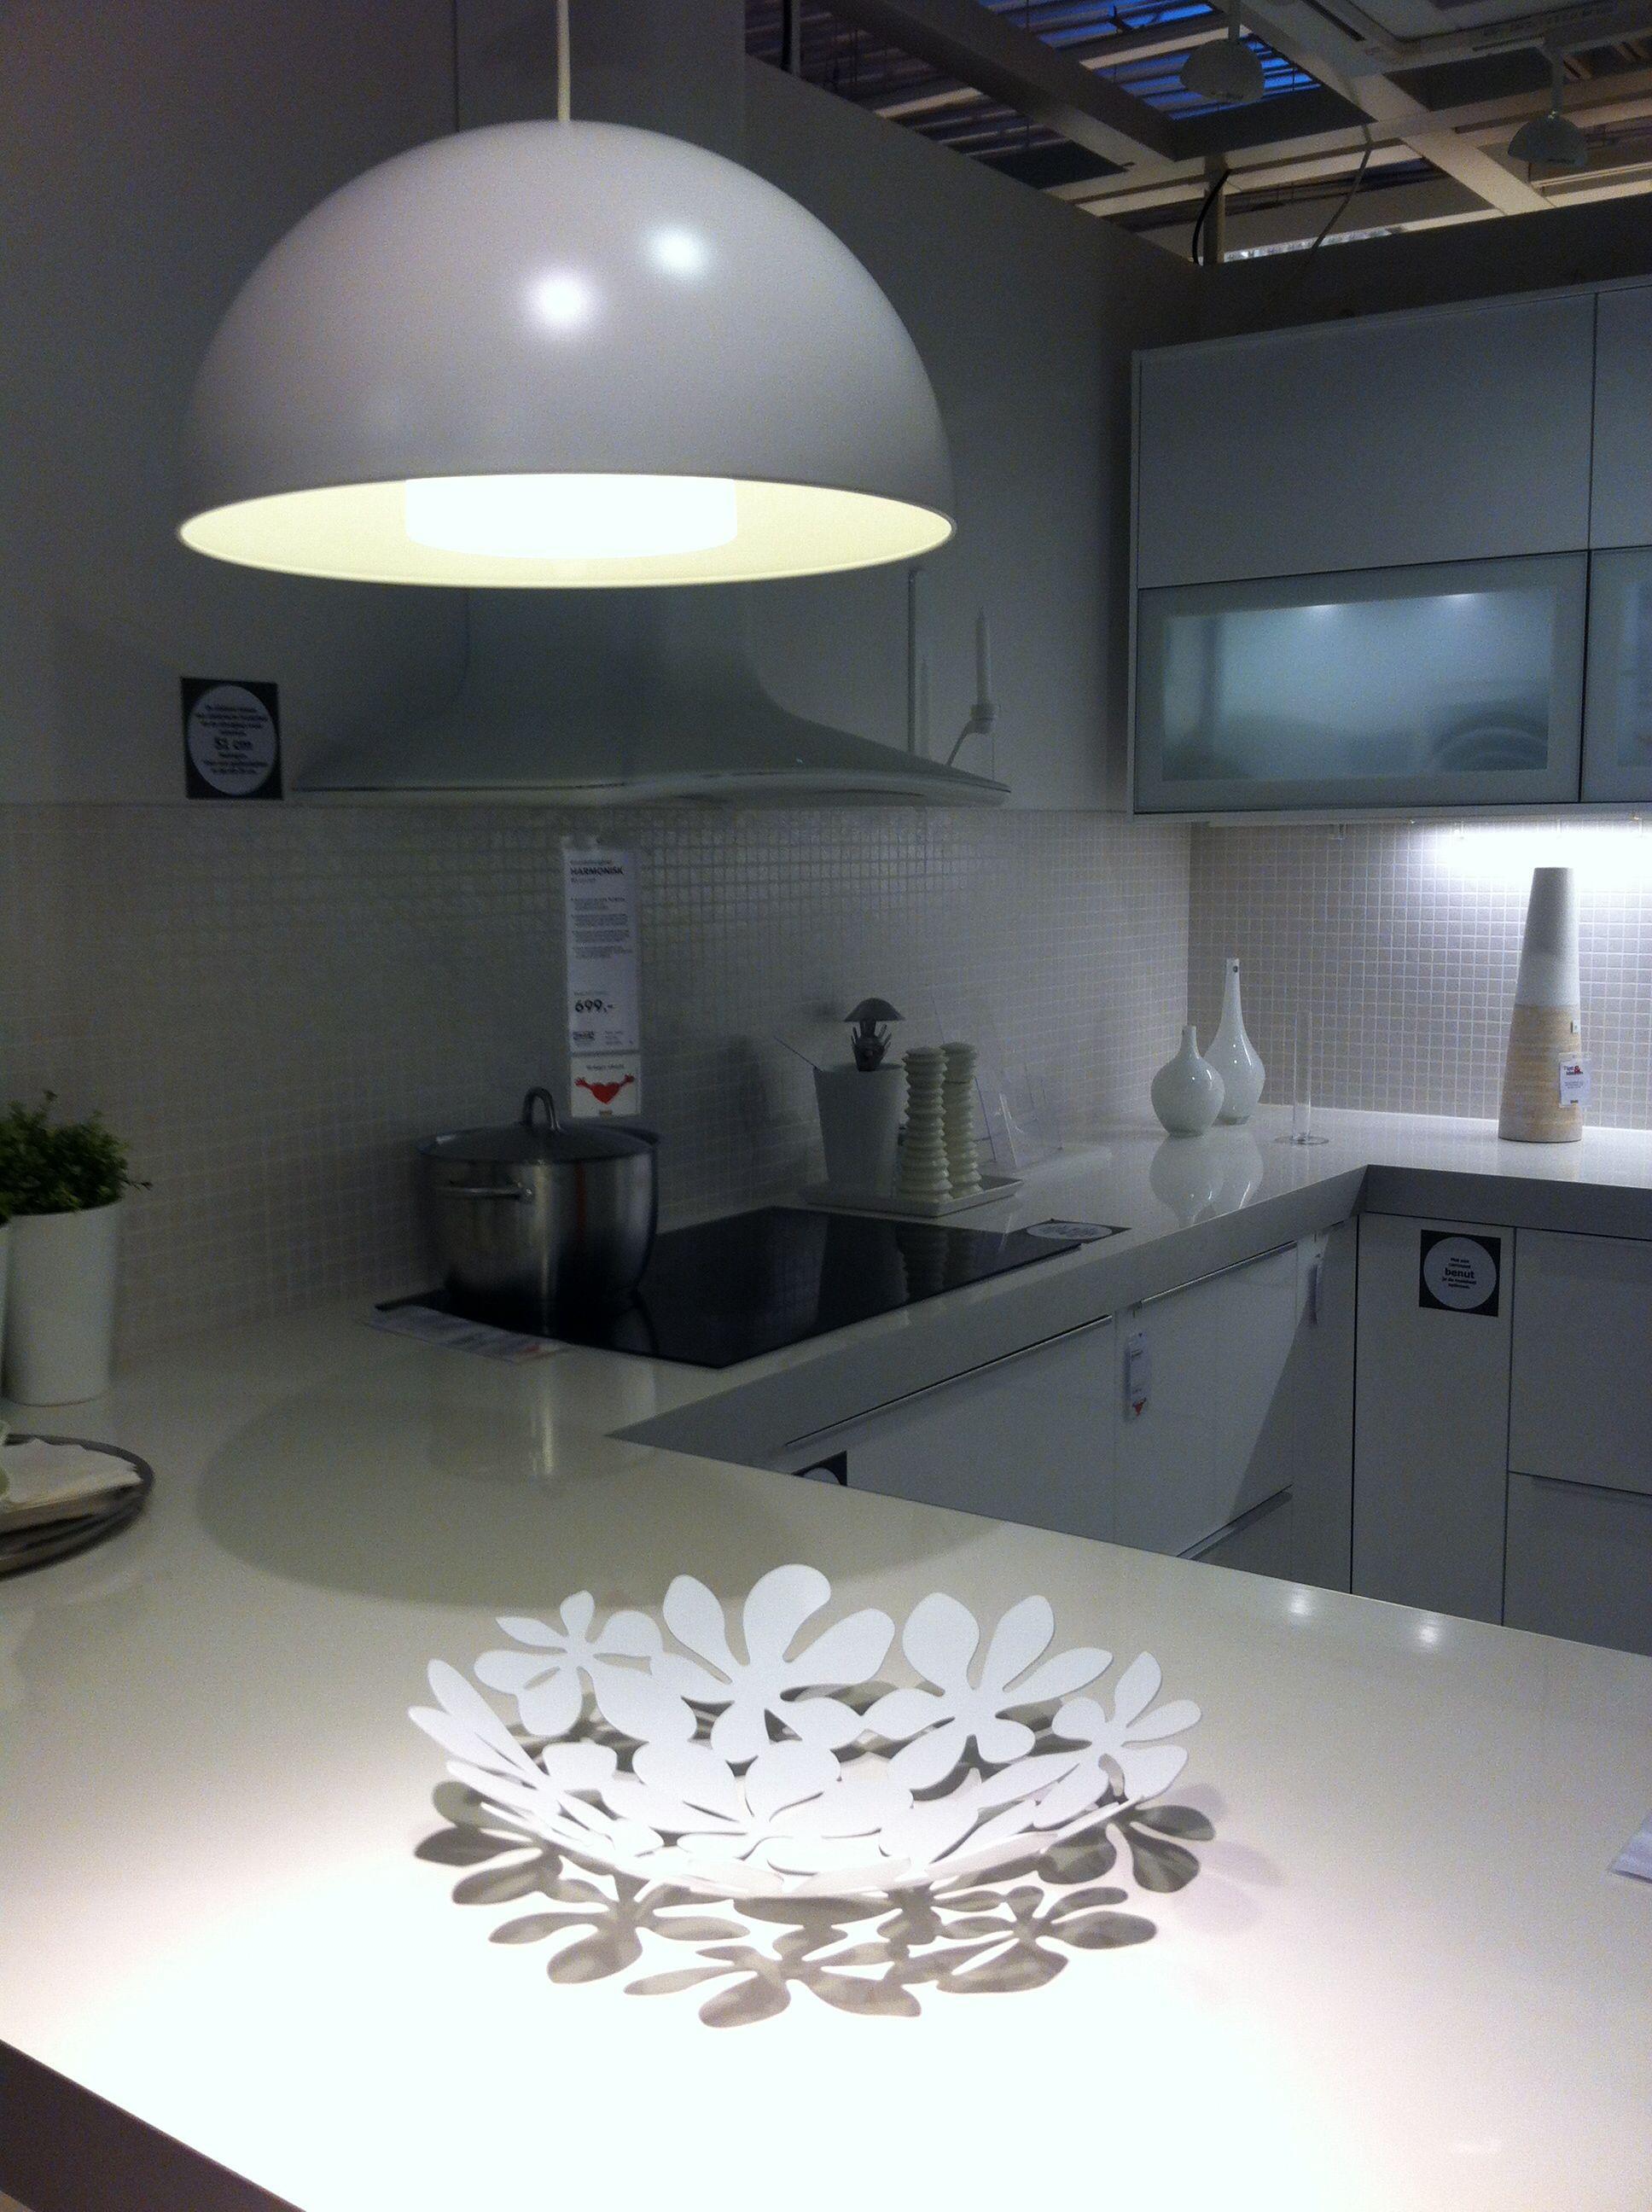 #46505A23640444  Wit Keuken 6 Ikea Gent Casa Ideas From Ikea Pinterest Ikea Van de bovenste plank Ikeakeukenplanner 3403 beeld 193625923403 Inspiratie